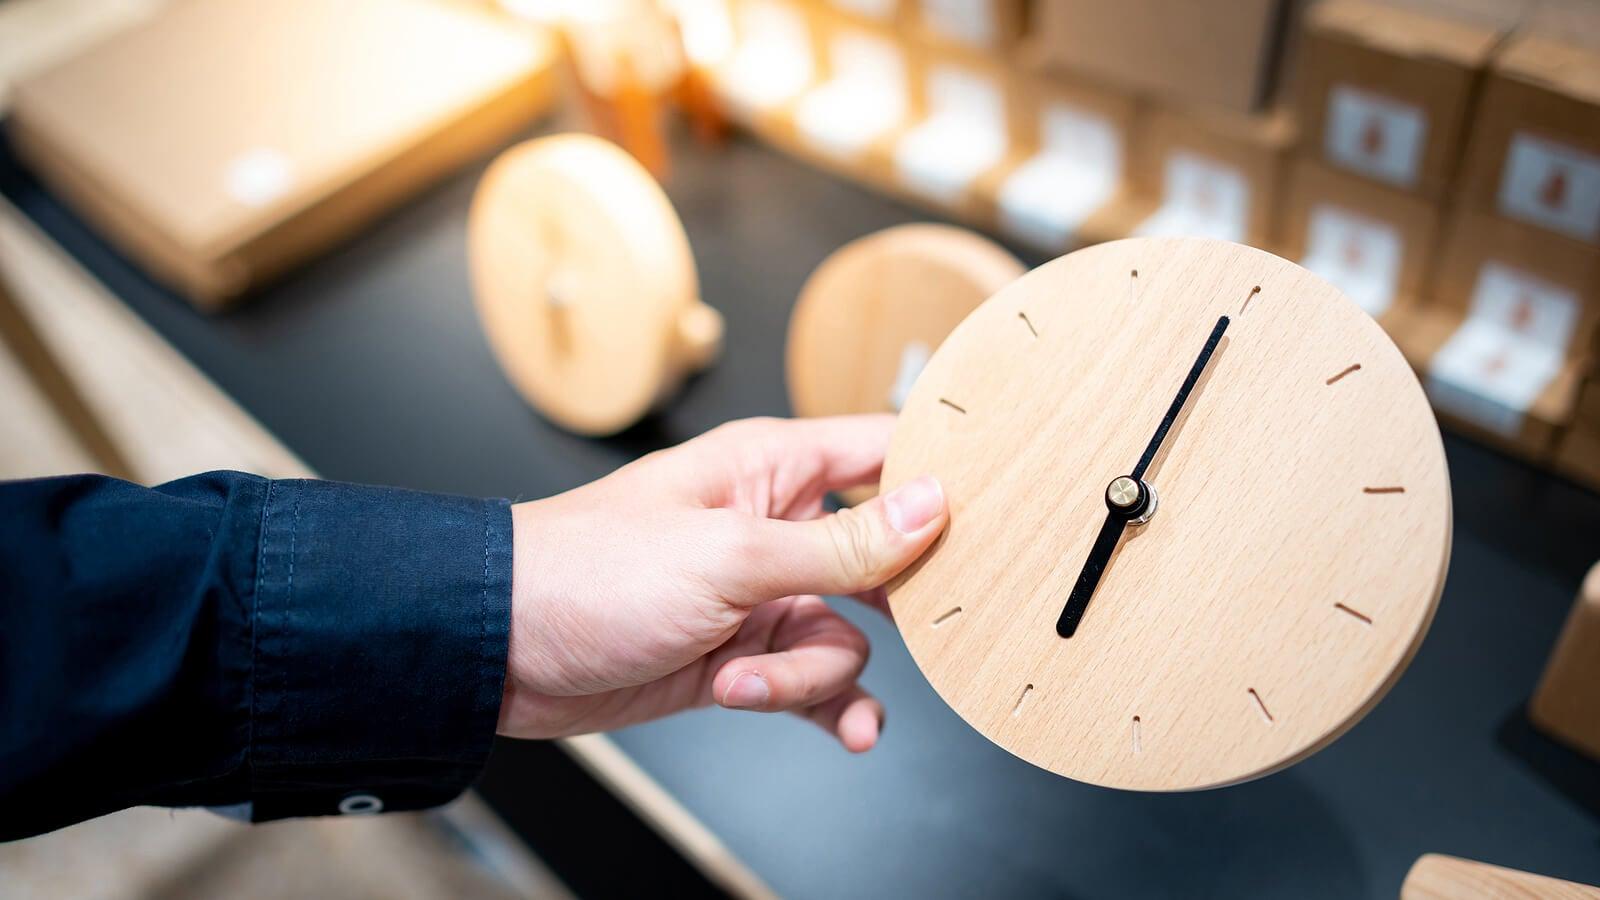 Reloj para aprender las horas.